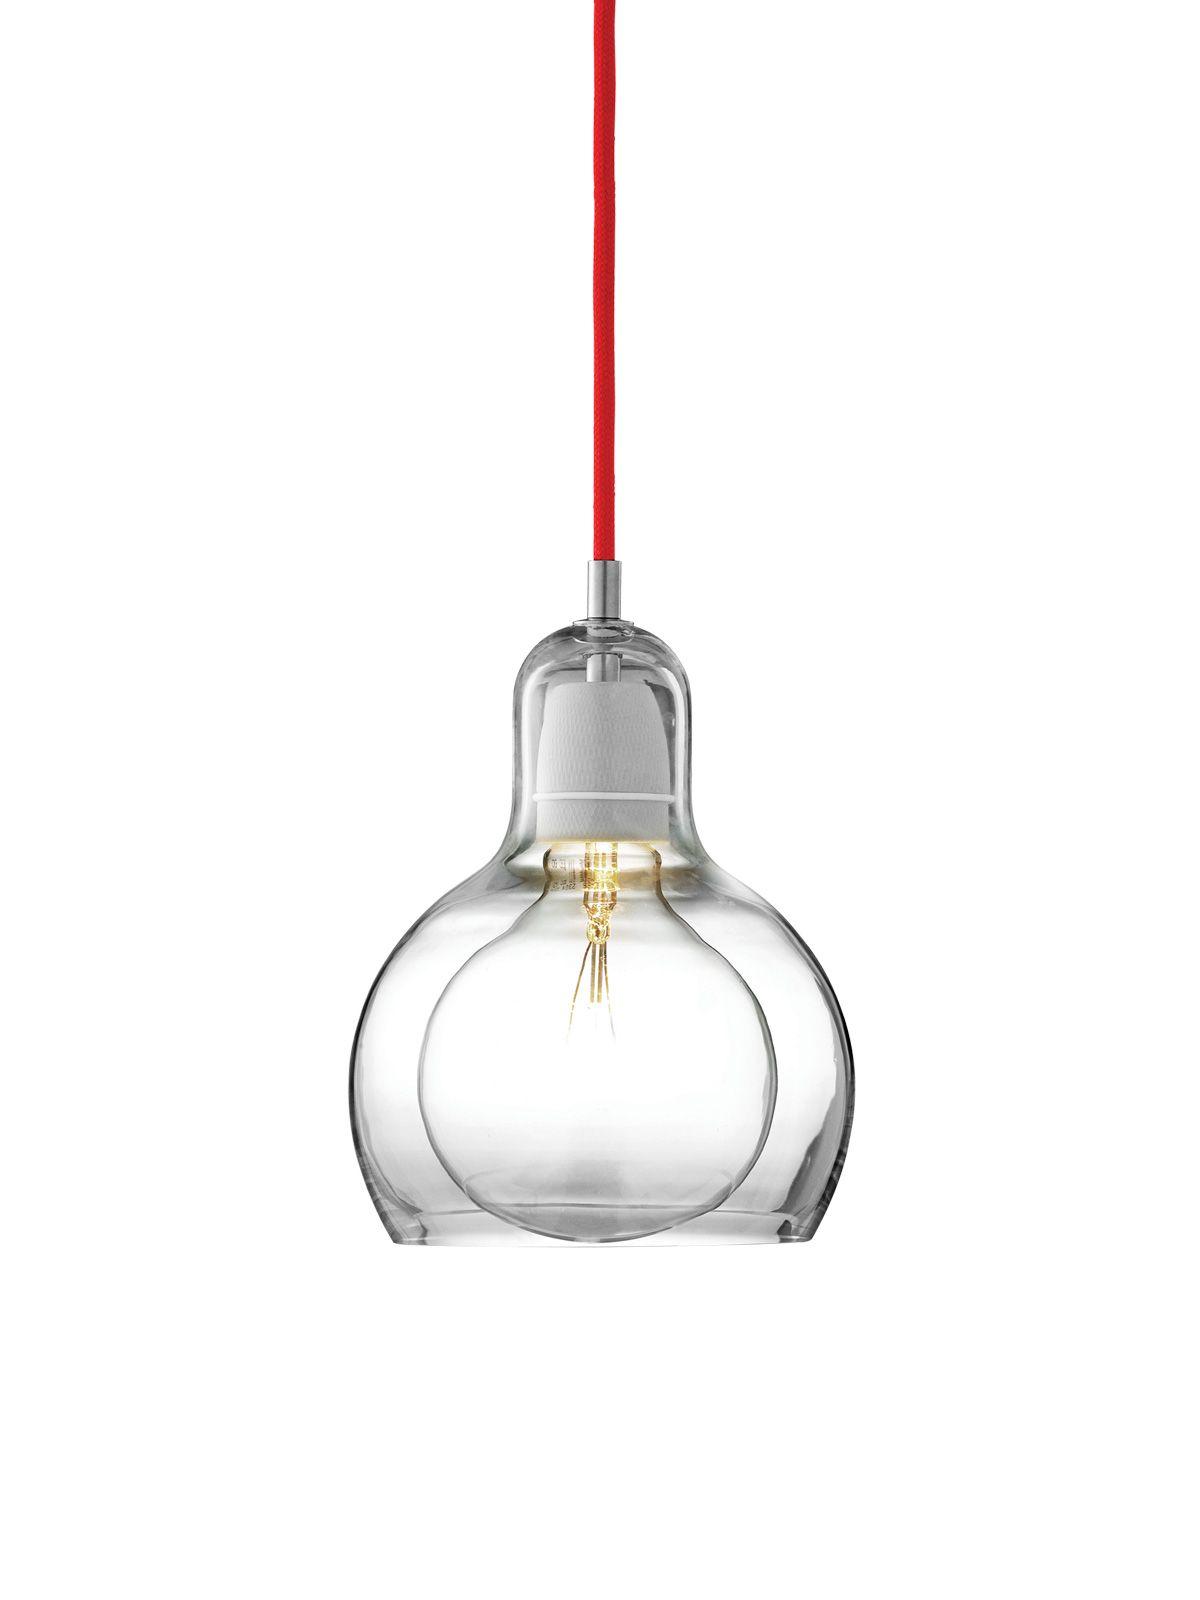 Mega Bulb Sr2 Gold Design Leuchten Lampen Und Leuchten Lampen